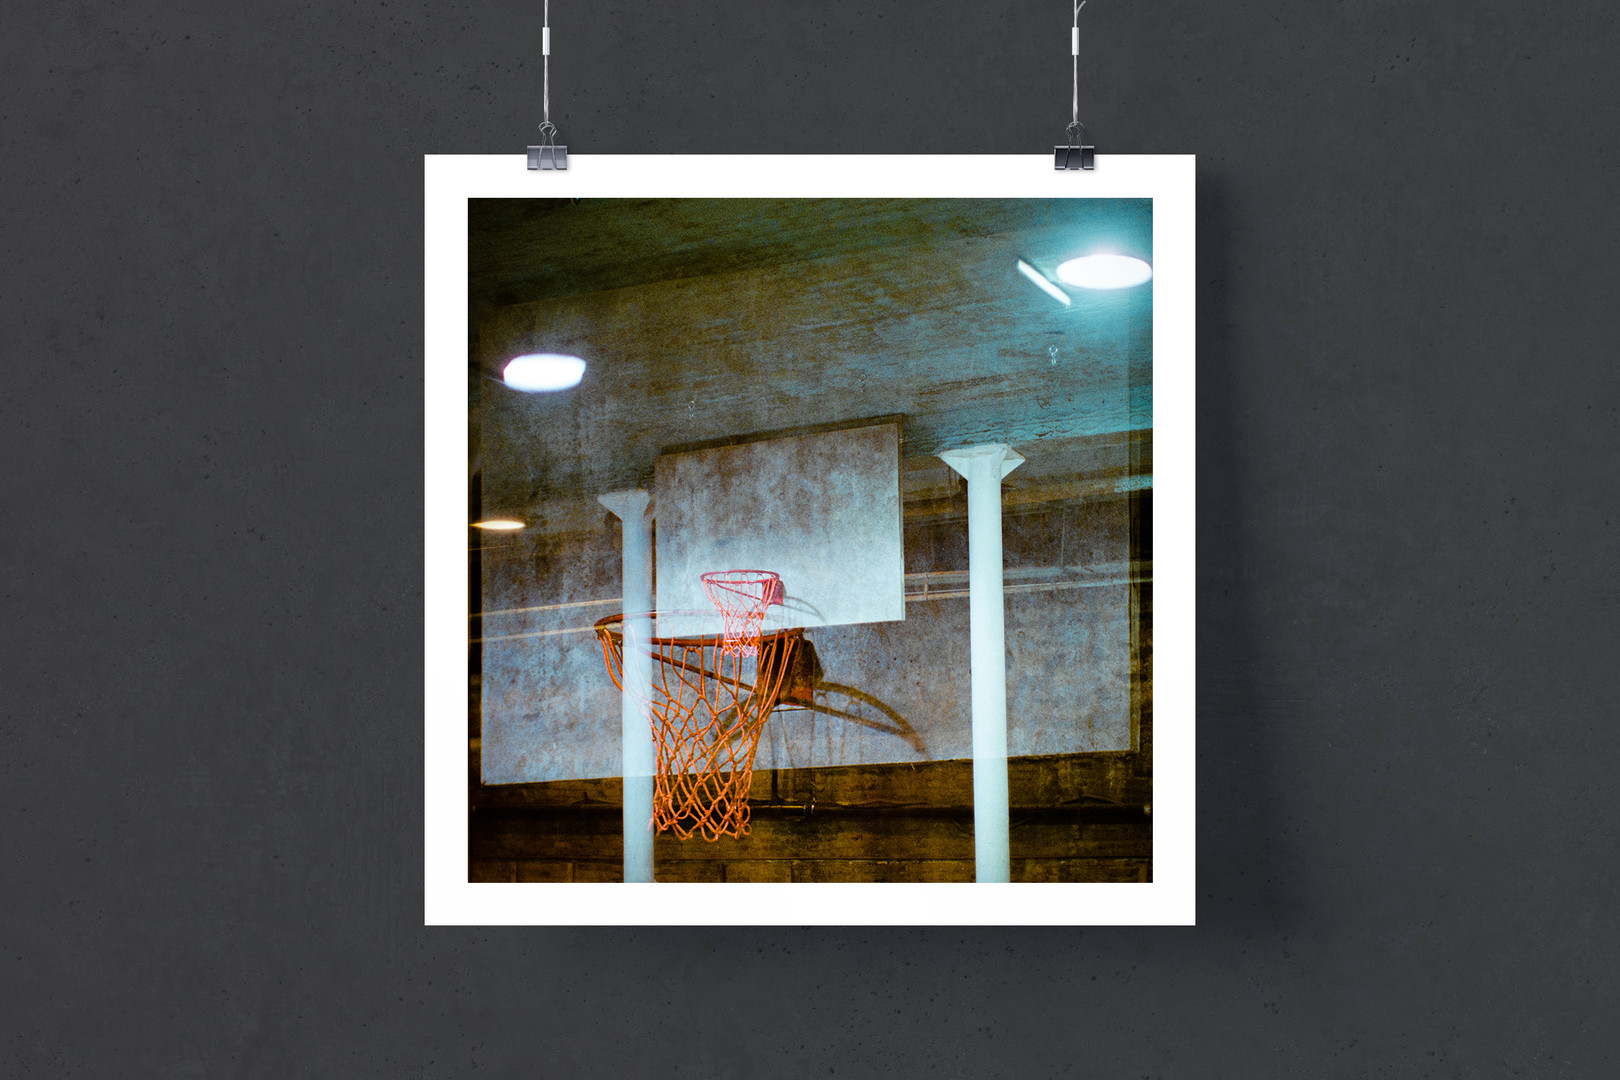 Through Hoops (2020) by Conrad Clifton